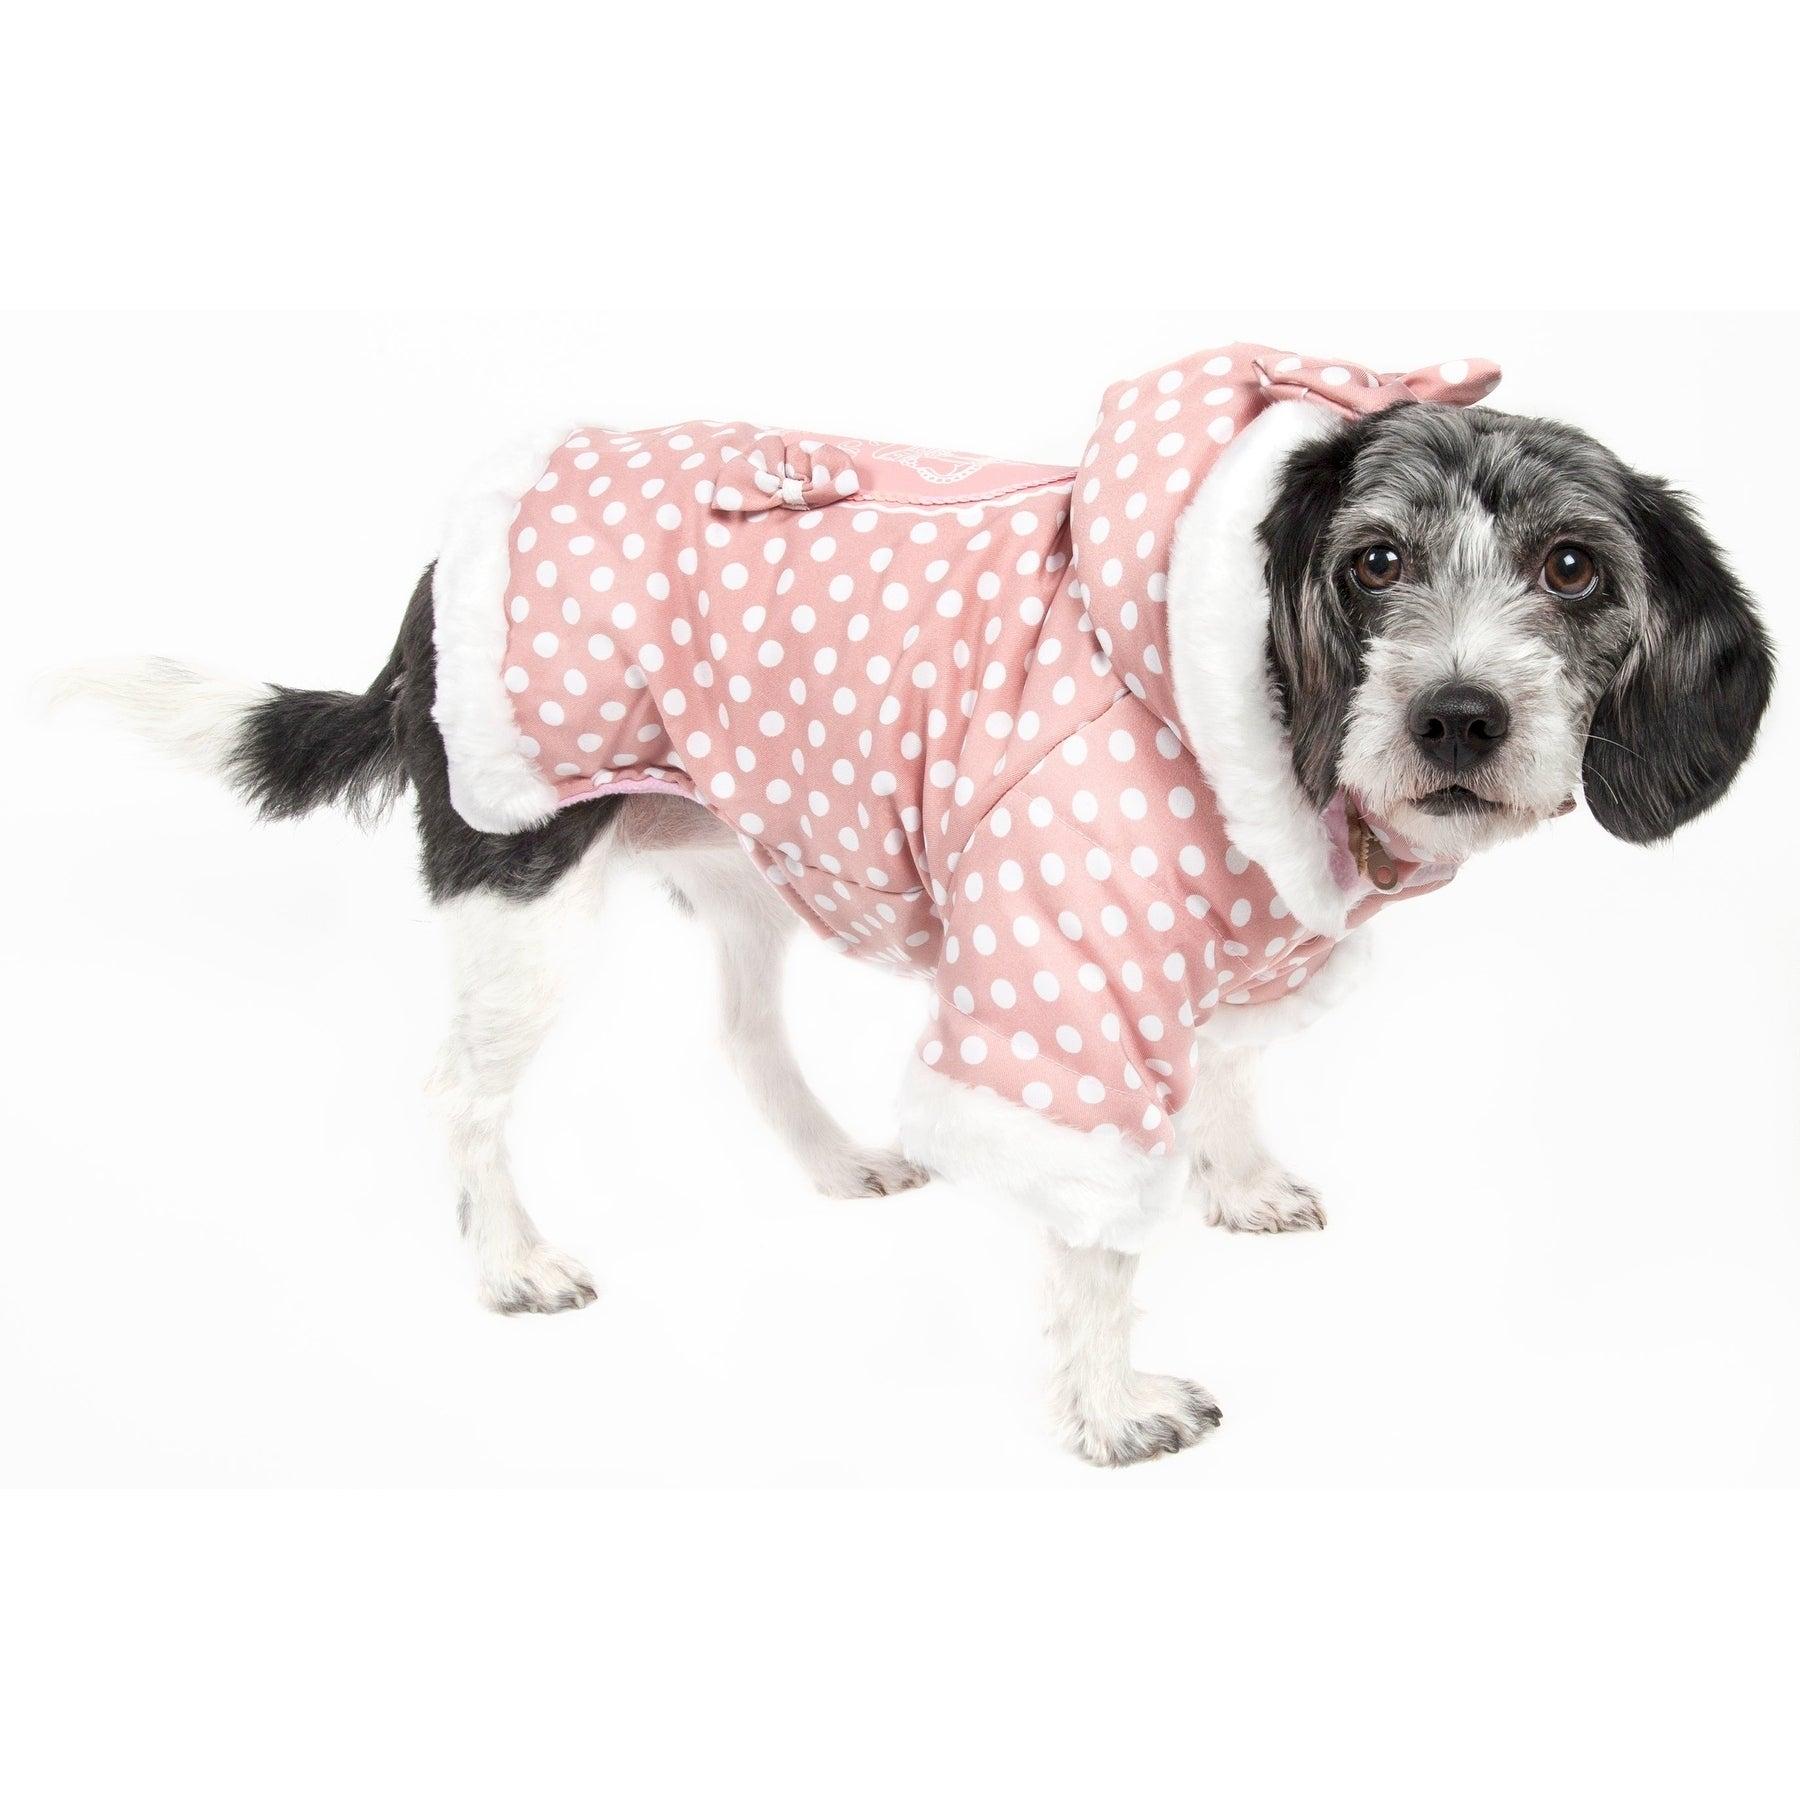 Petlife Pink / White Polka-dot Hooded Pet Sweatshirt (Small)